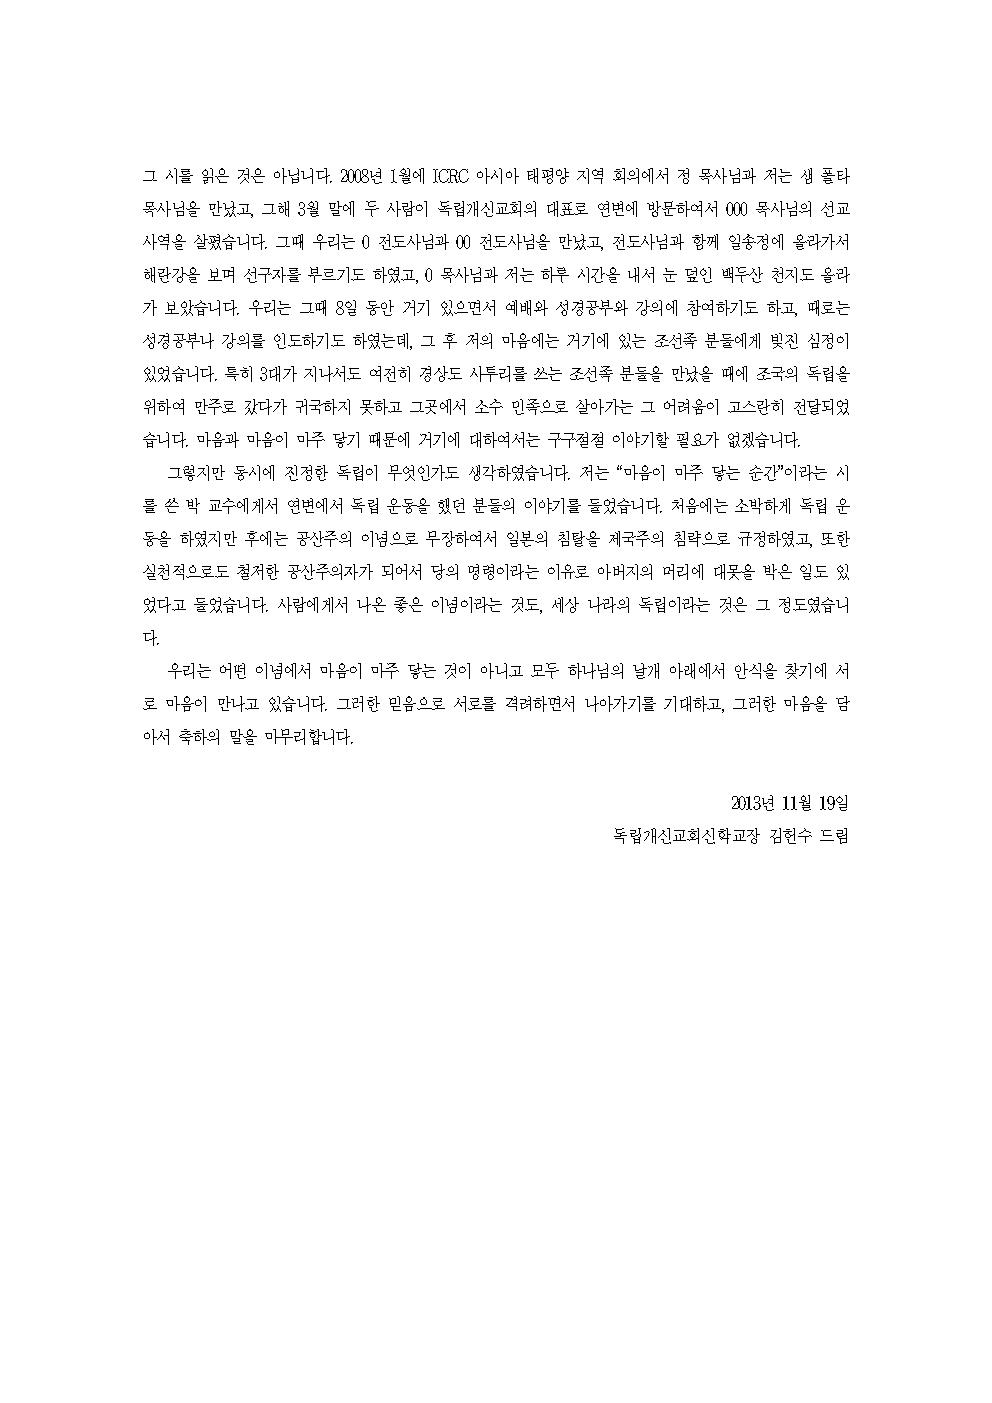 O 전도사 환영인사004.png